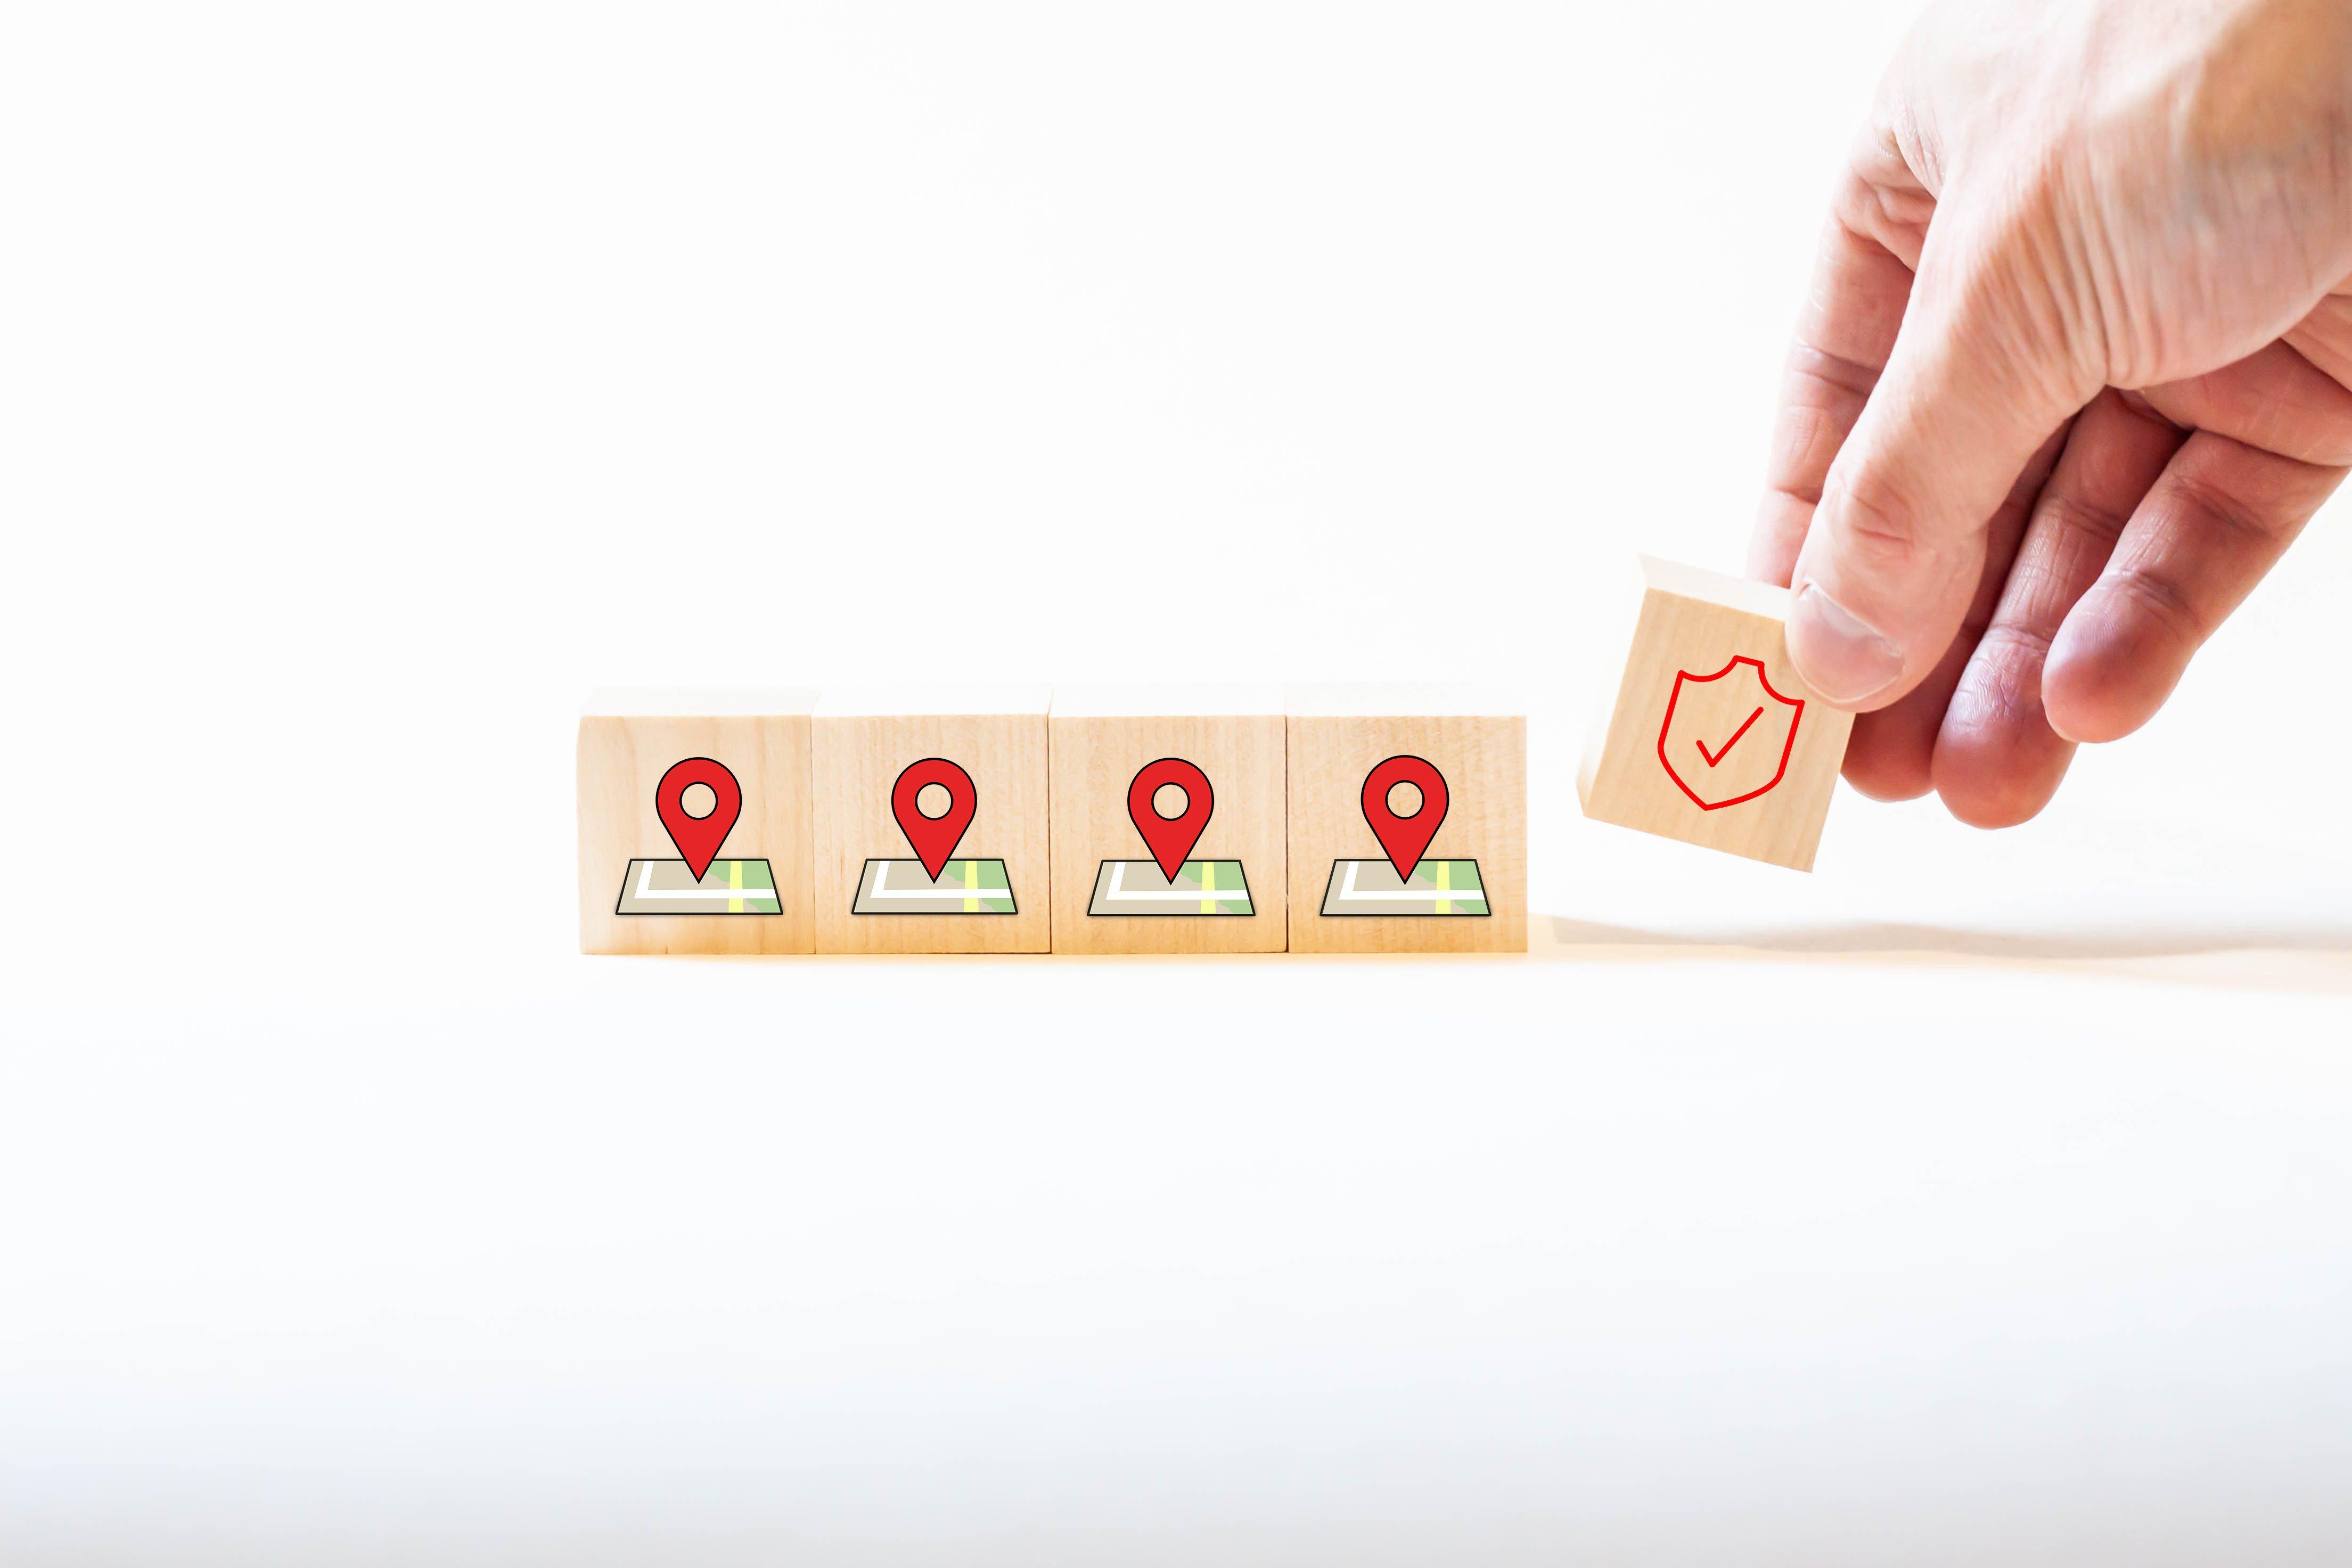 VOZIQ Location based Intelligence Customer Retention Solution